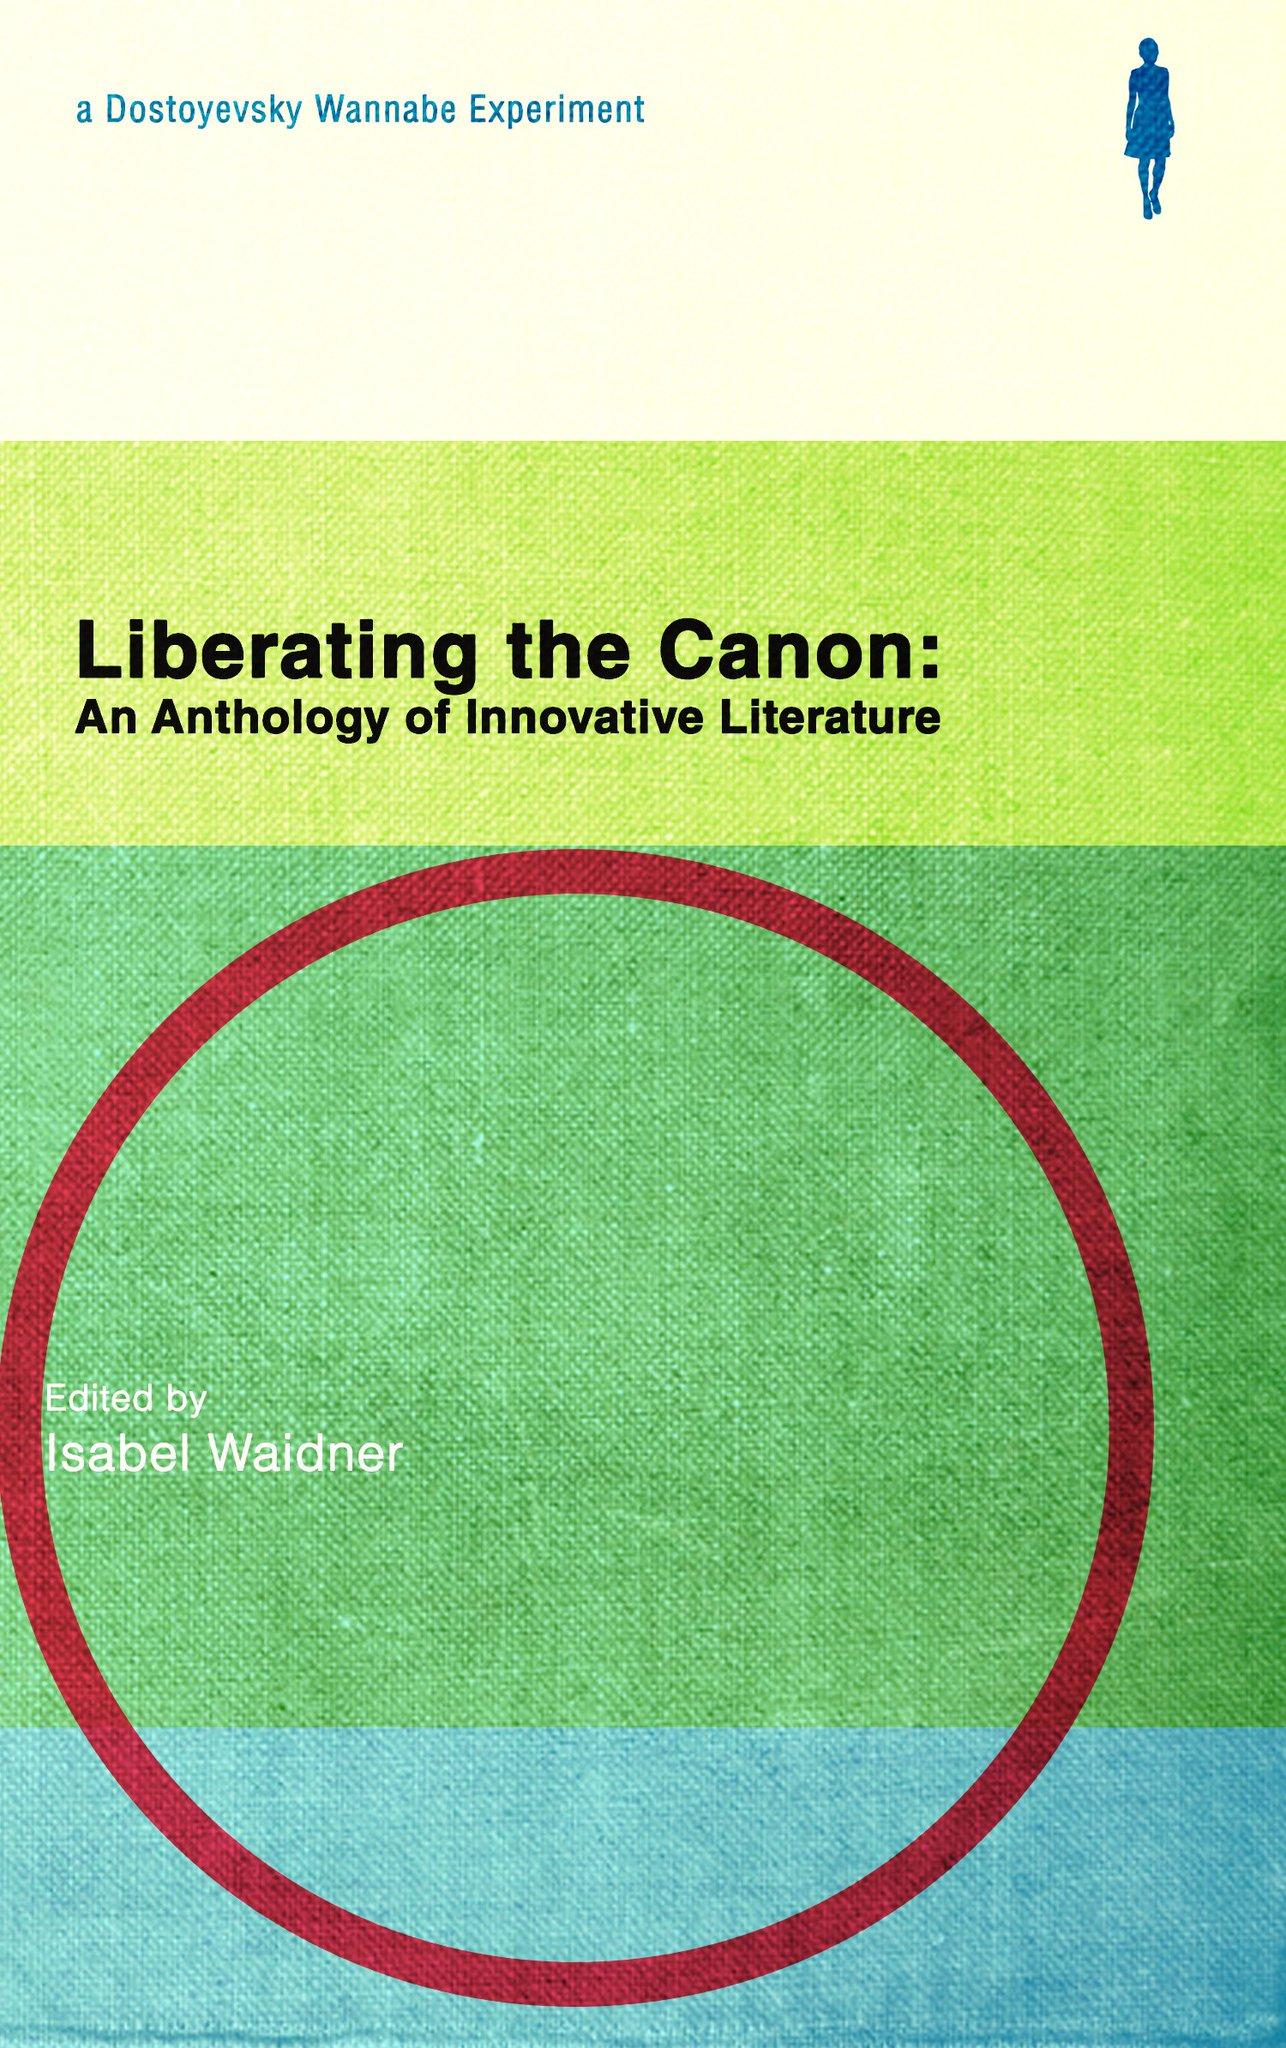 Liberating the Canon  / ed. Isabel Waidner /  Dostoyevsky Wannabe